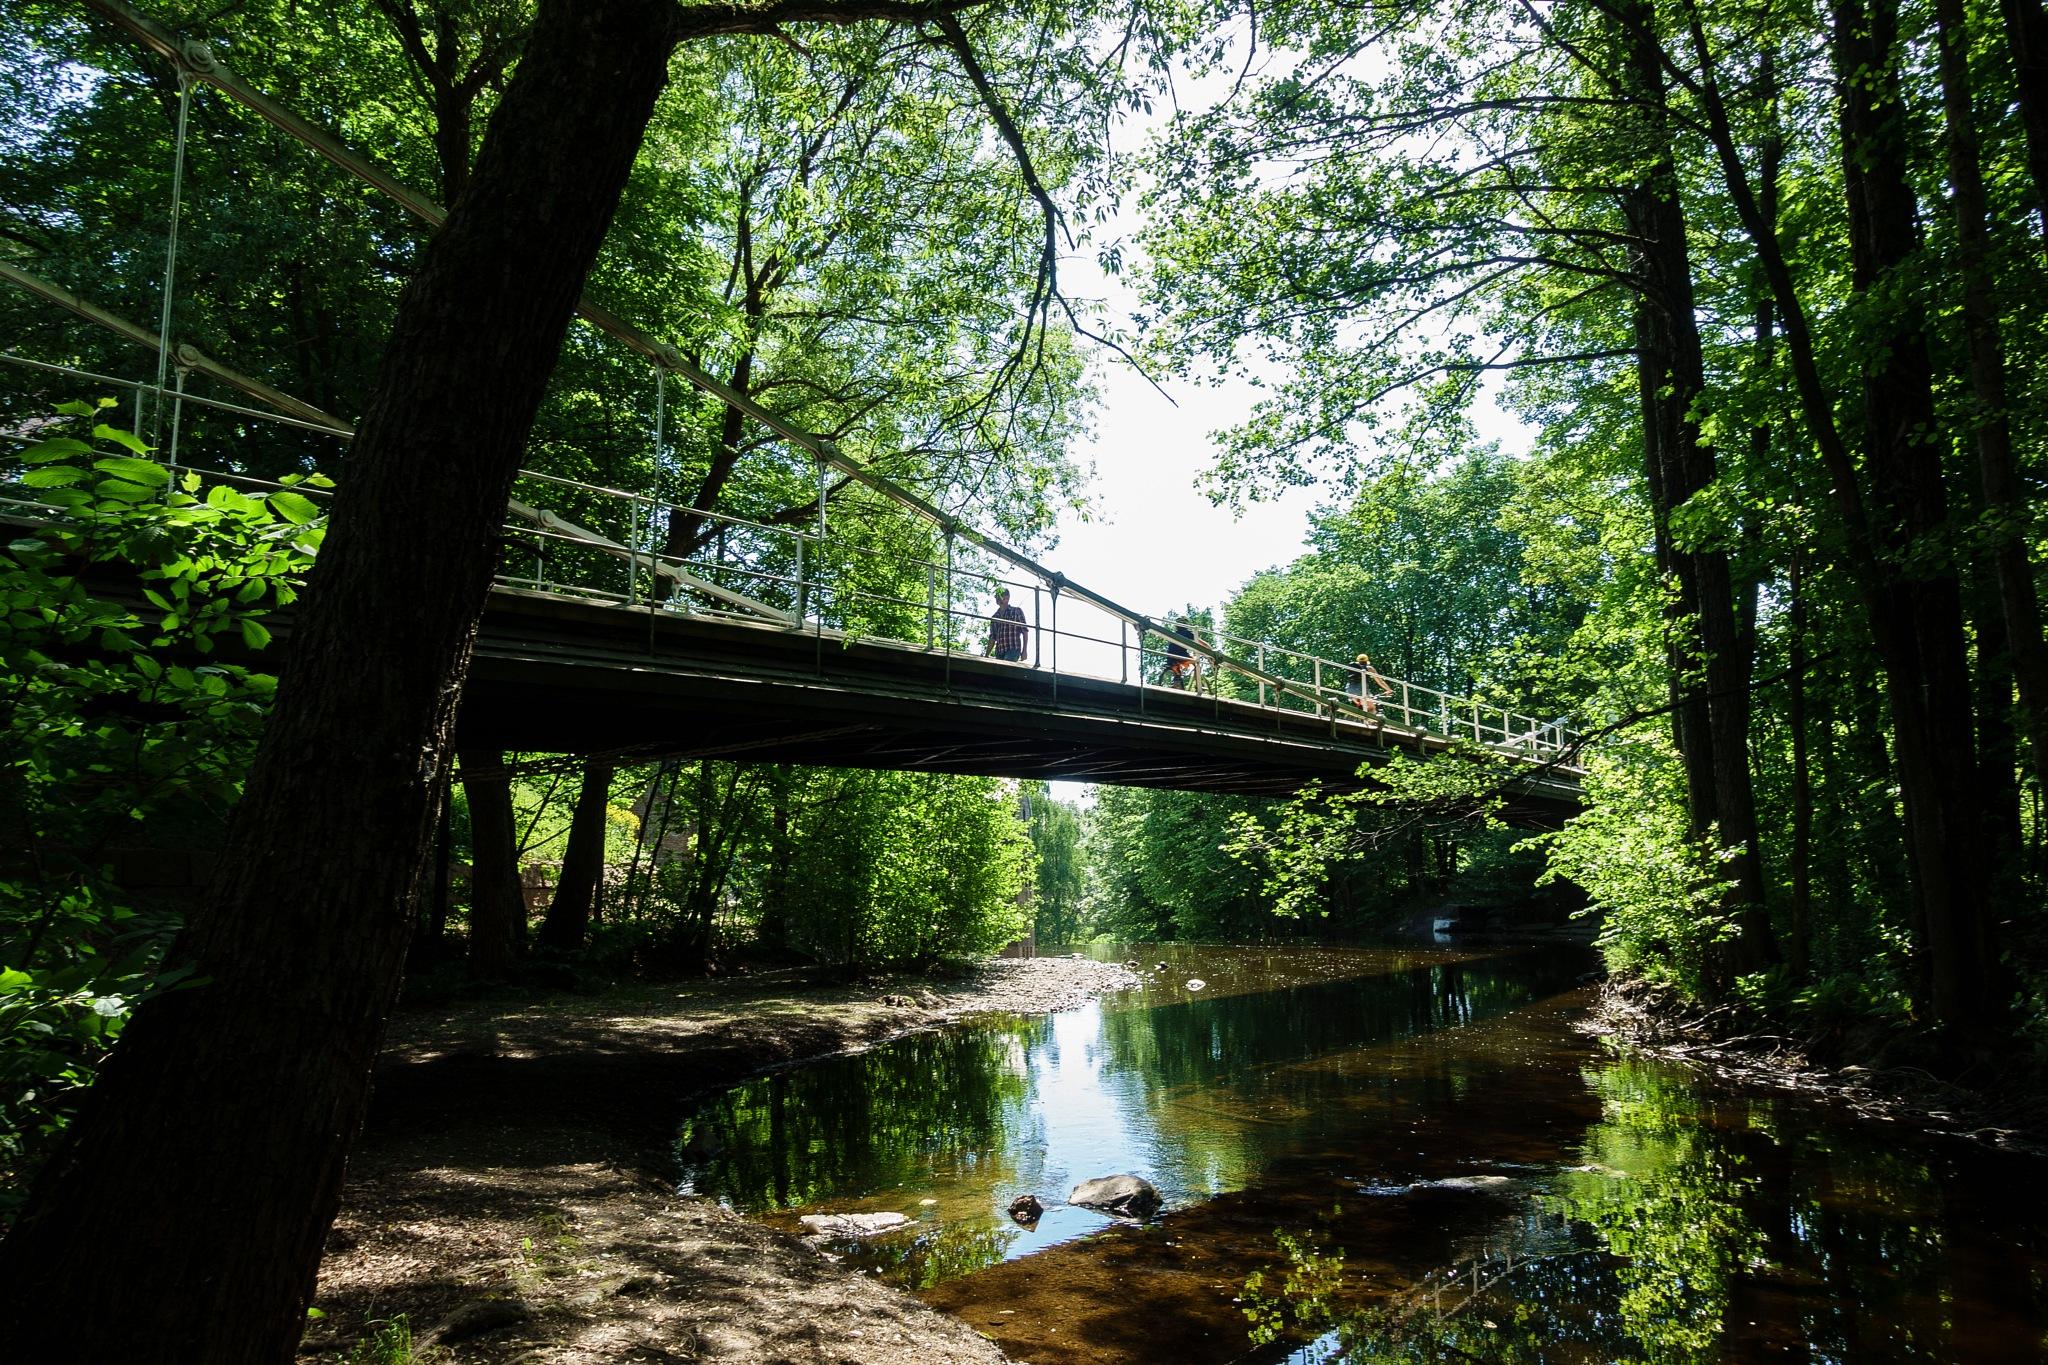 Aamodt bridge and Akerselva by JonArneFoss